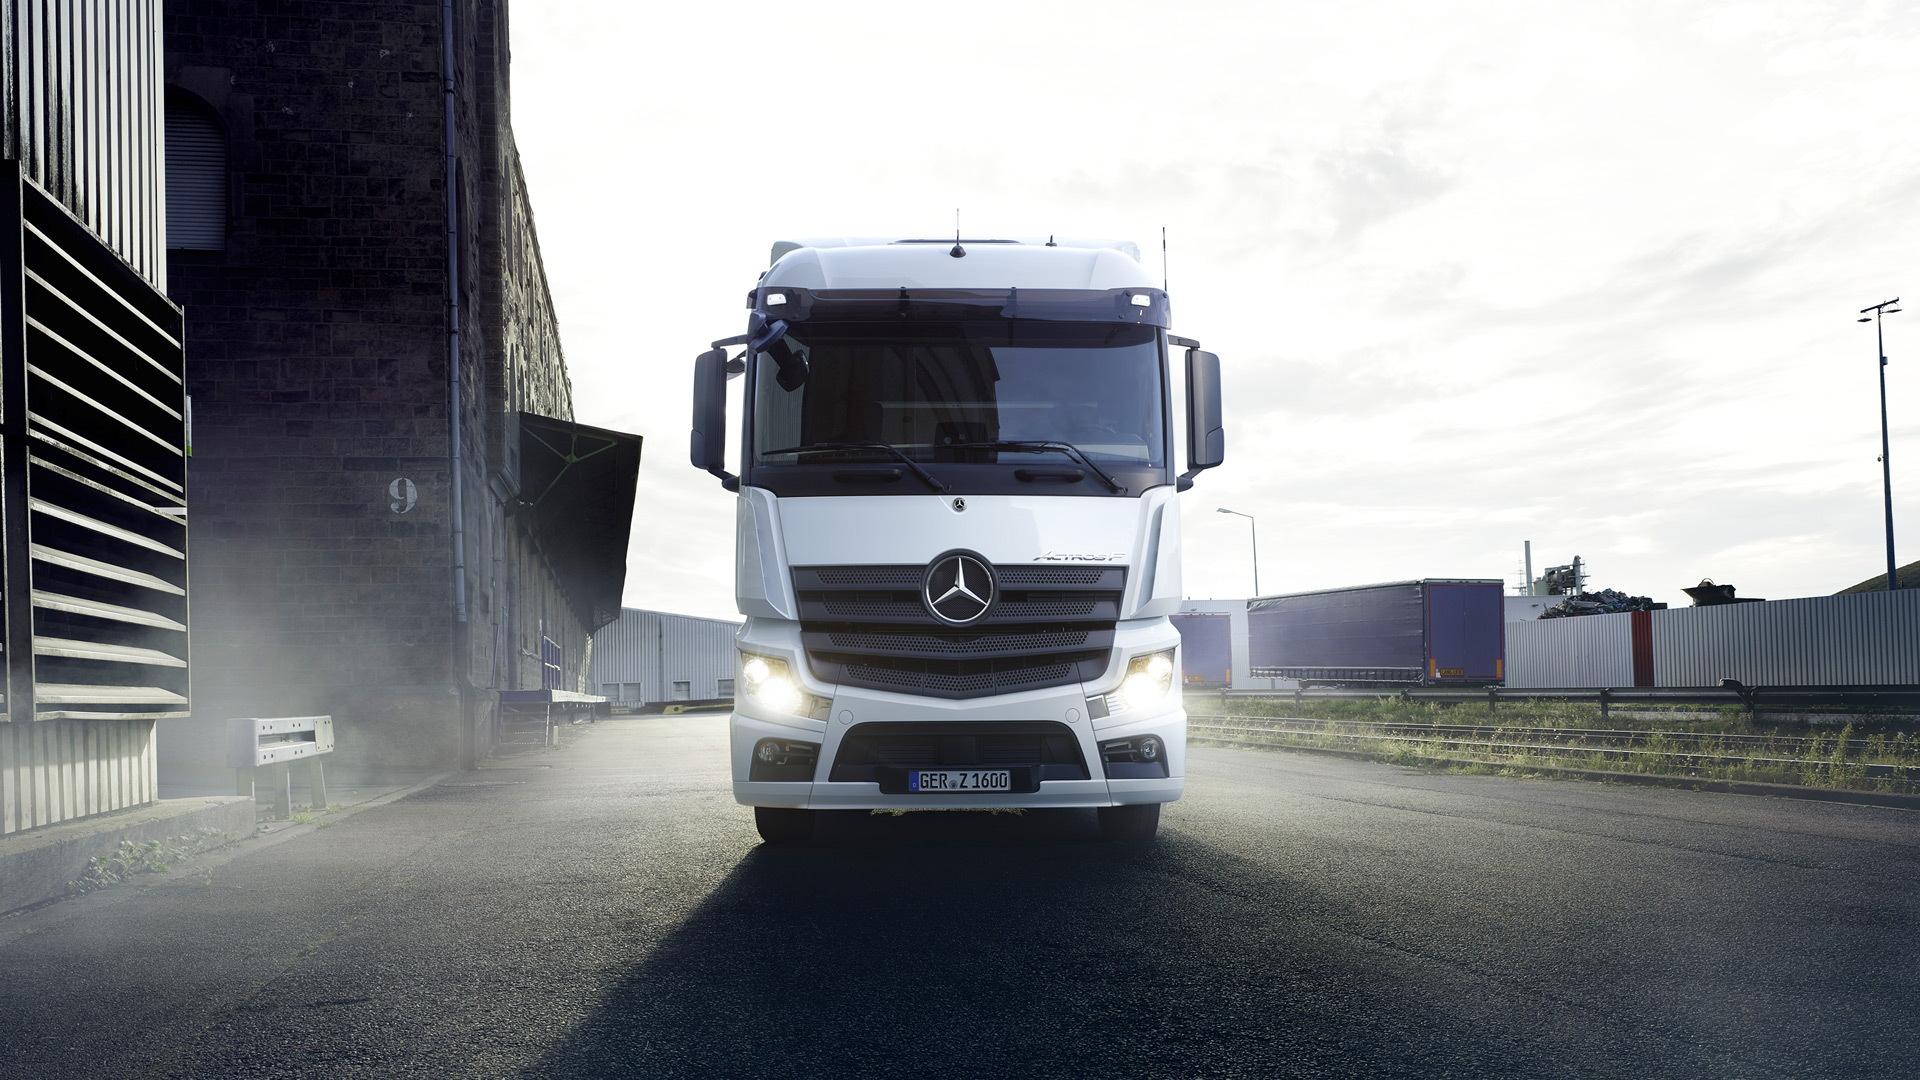 Mercedes-Benz Actros semi-trailer truck